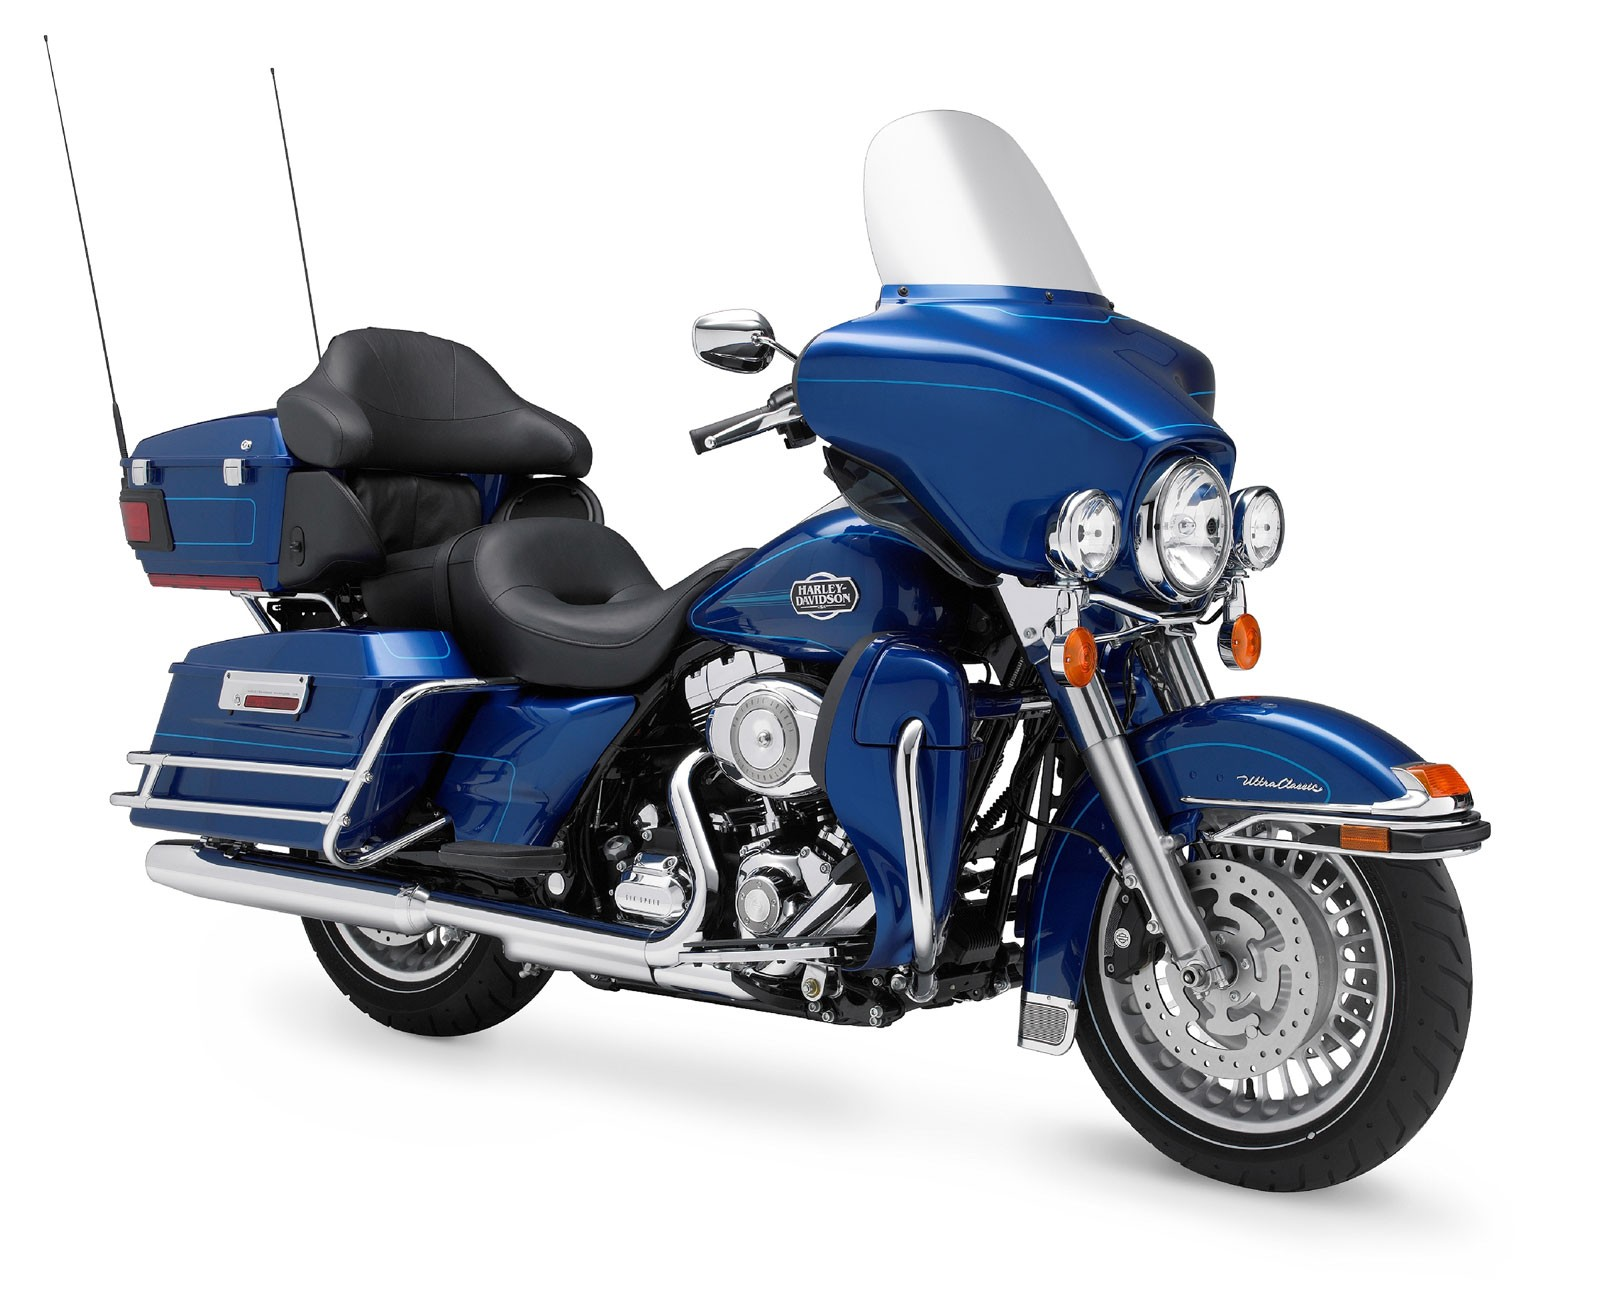 HARLEY DAVIDSON Ultra Classic Electra Glide specs 2008